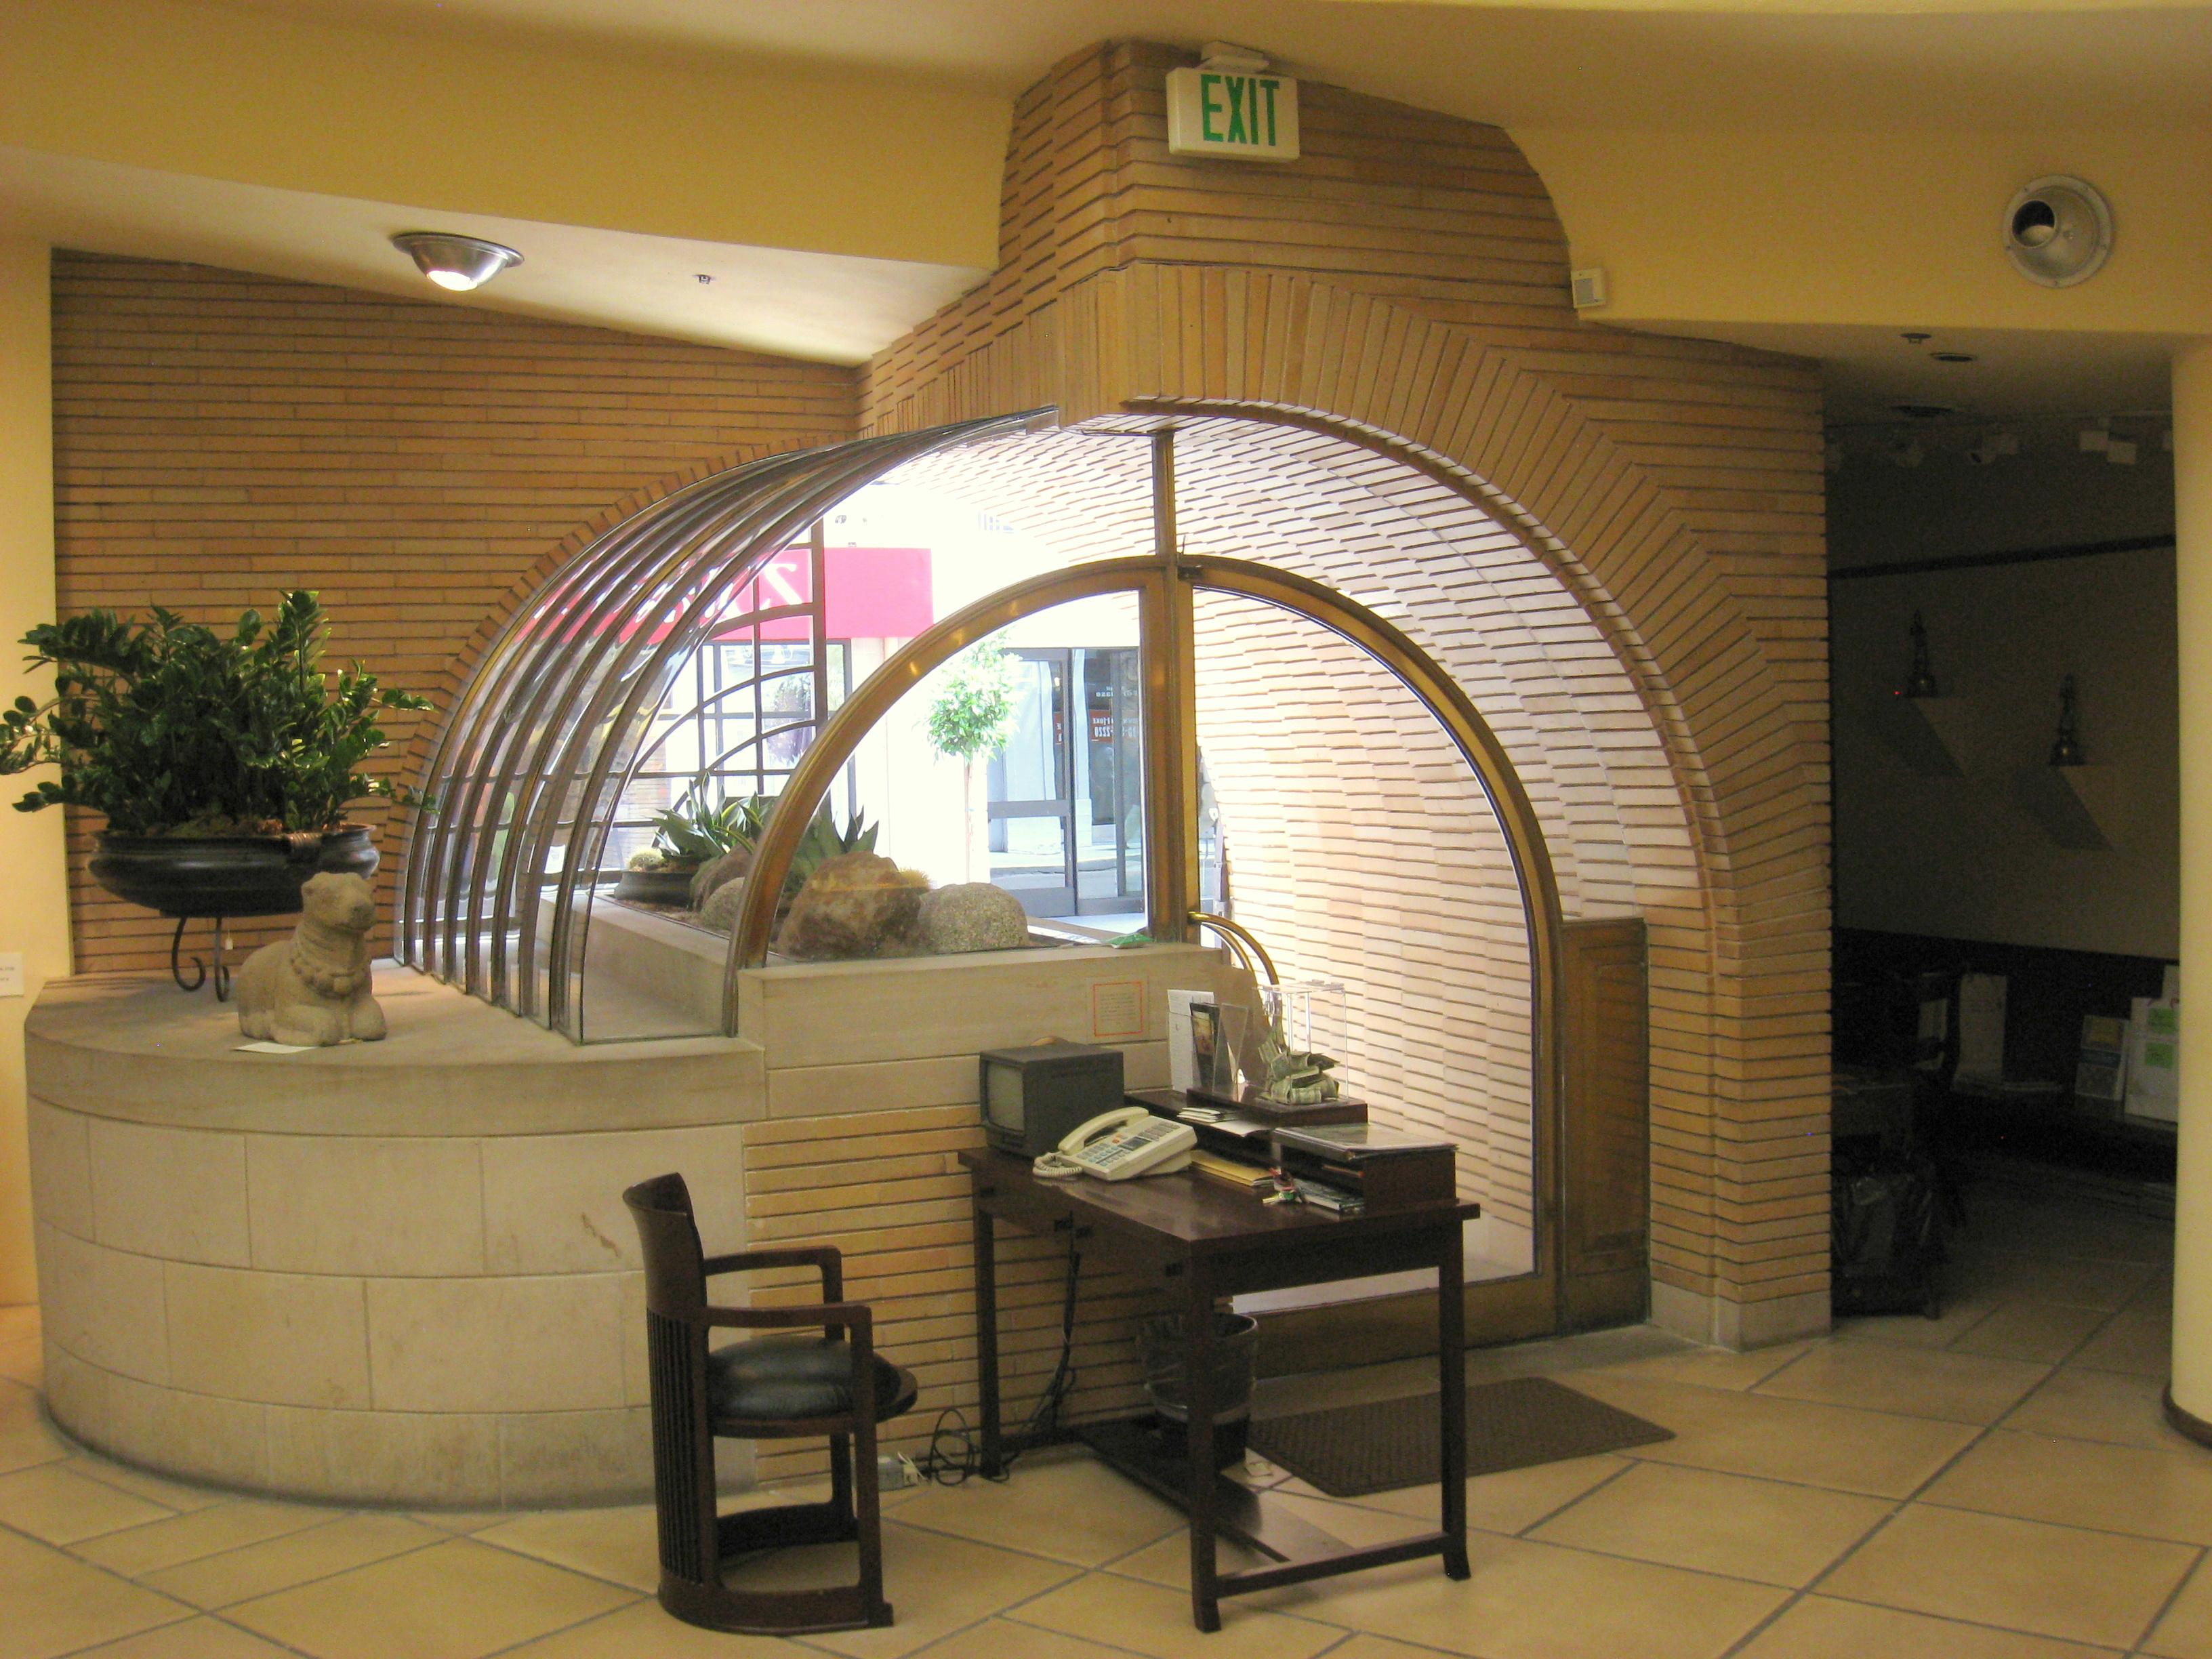 FileFrank Lloyd Wright VC Morris Gift Shop SF 14